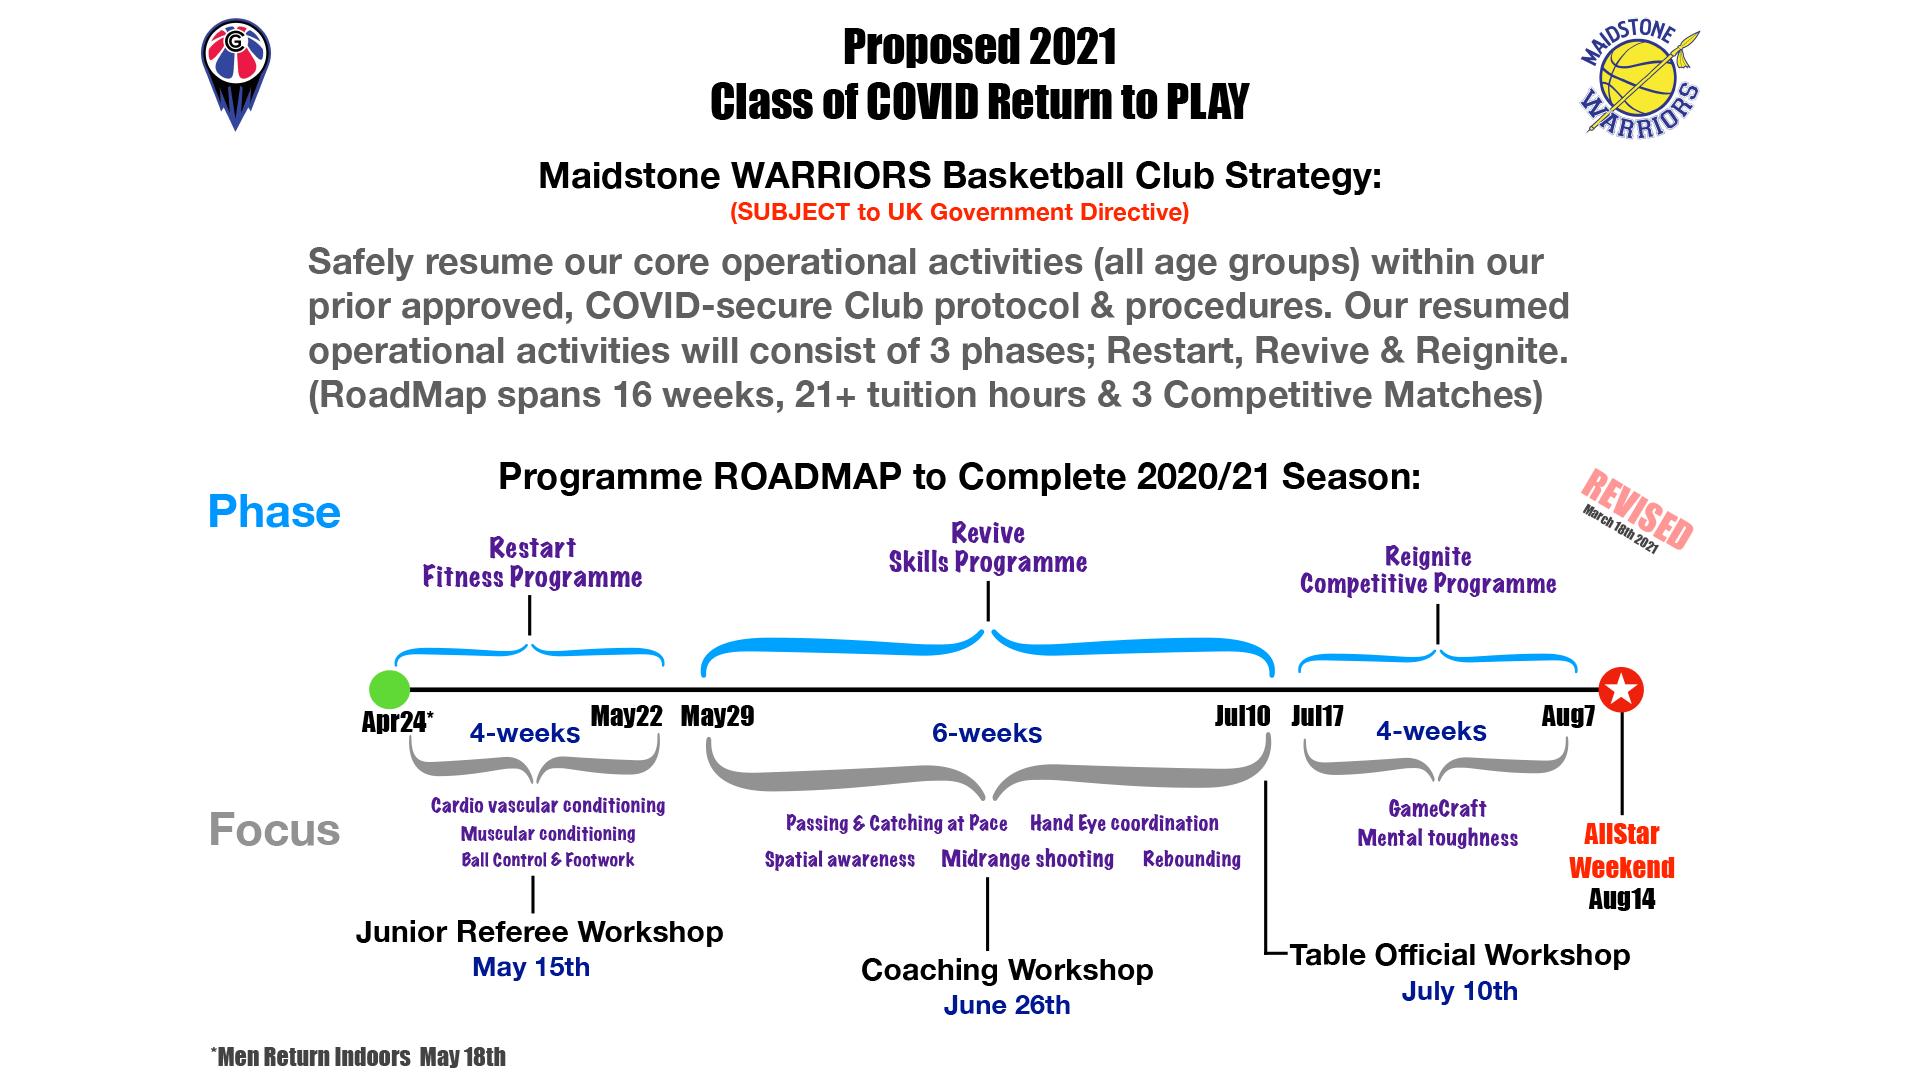 https://i0.wp.com/maidstonewarriors.co.uk/wp-content/uploads/2021/03/Roadmap.png?fit=1920%2C1080&ssl=1